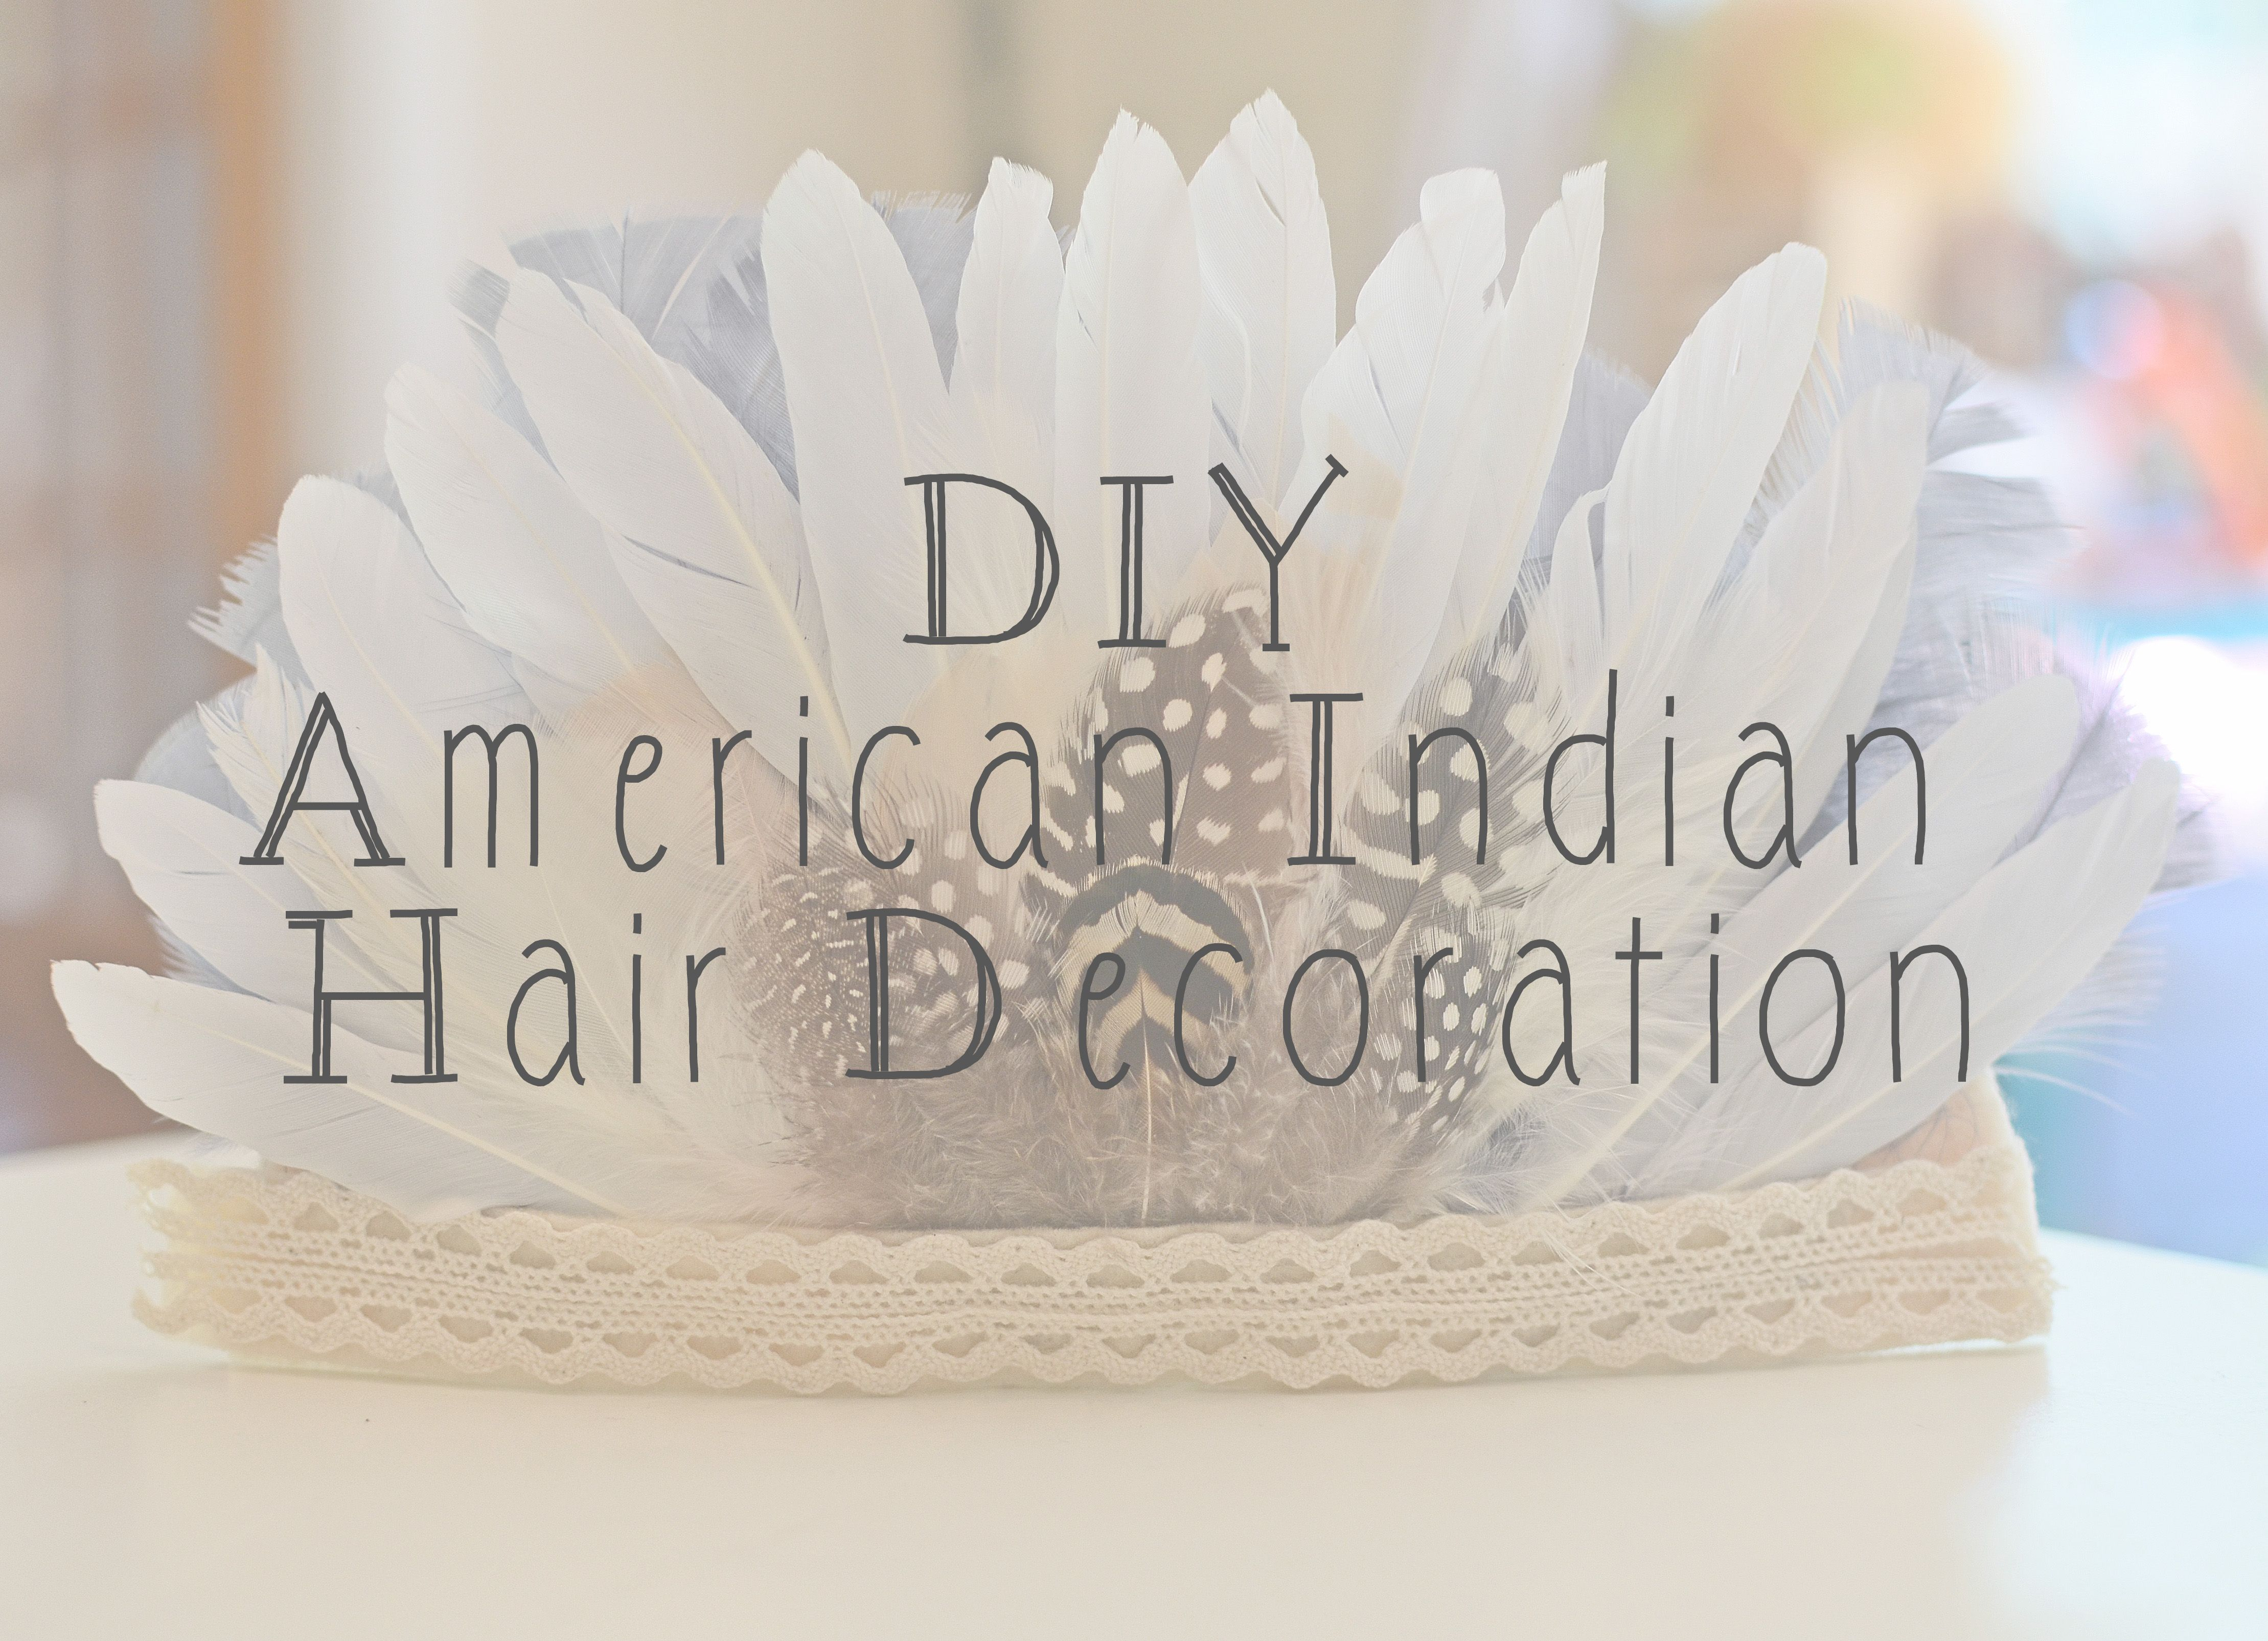 Diy american indian head piece akimonoandaclutchwordpress